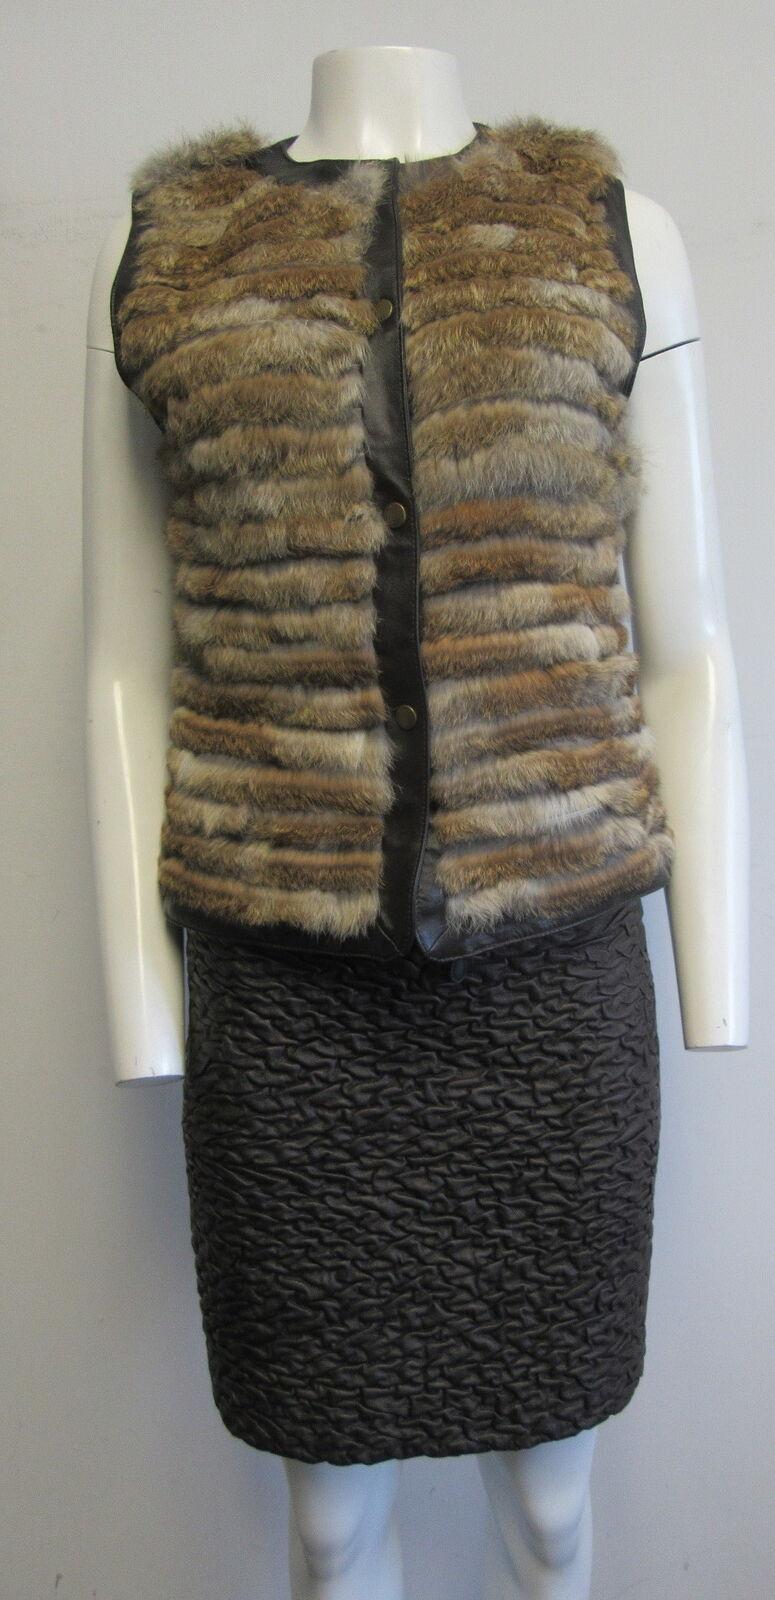 JAVIER SIMORRA brown rabbit fur & polyleather 2 piece skirt outfit sz I 38  US 4